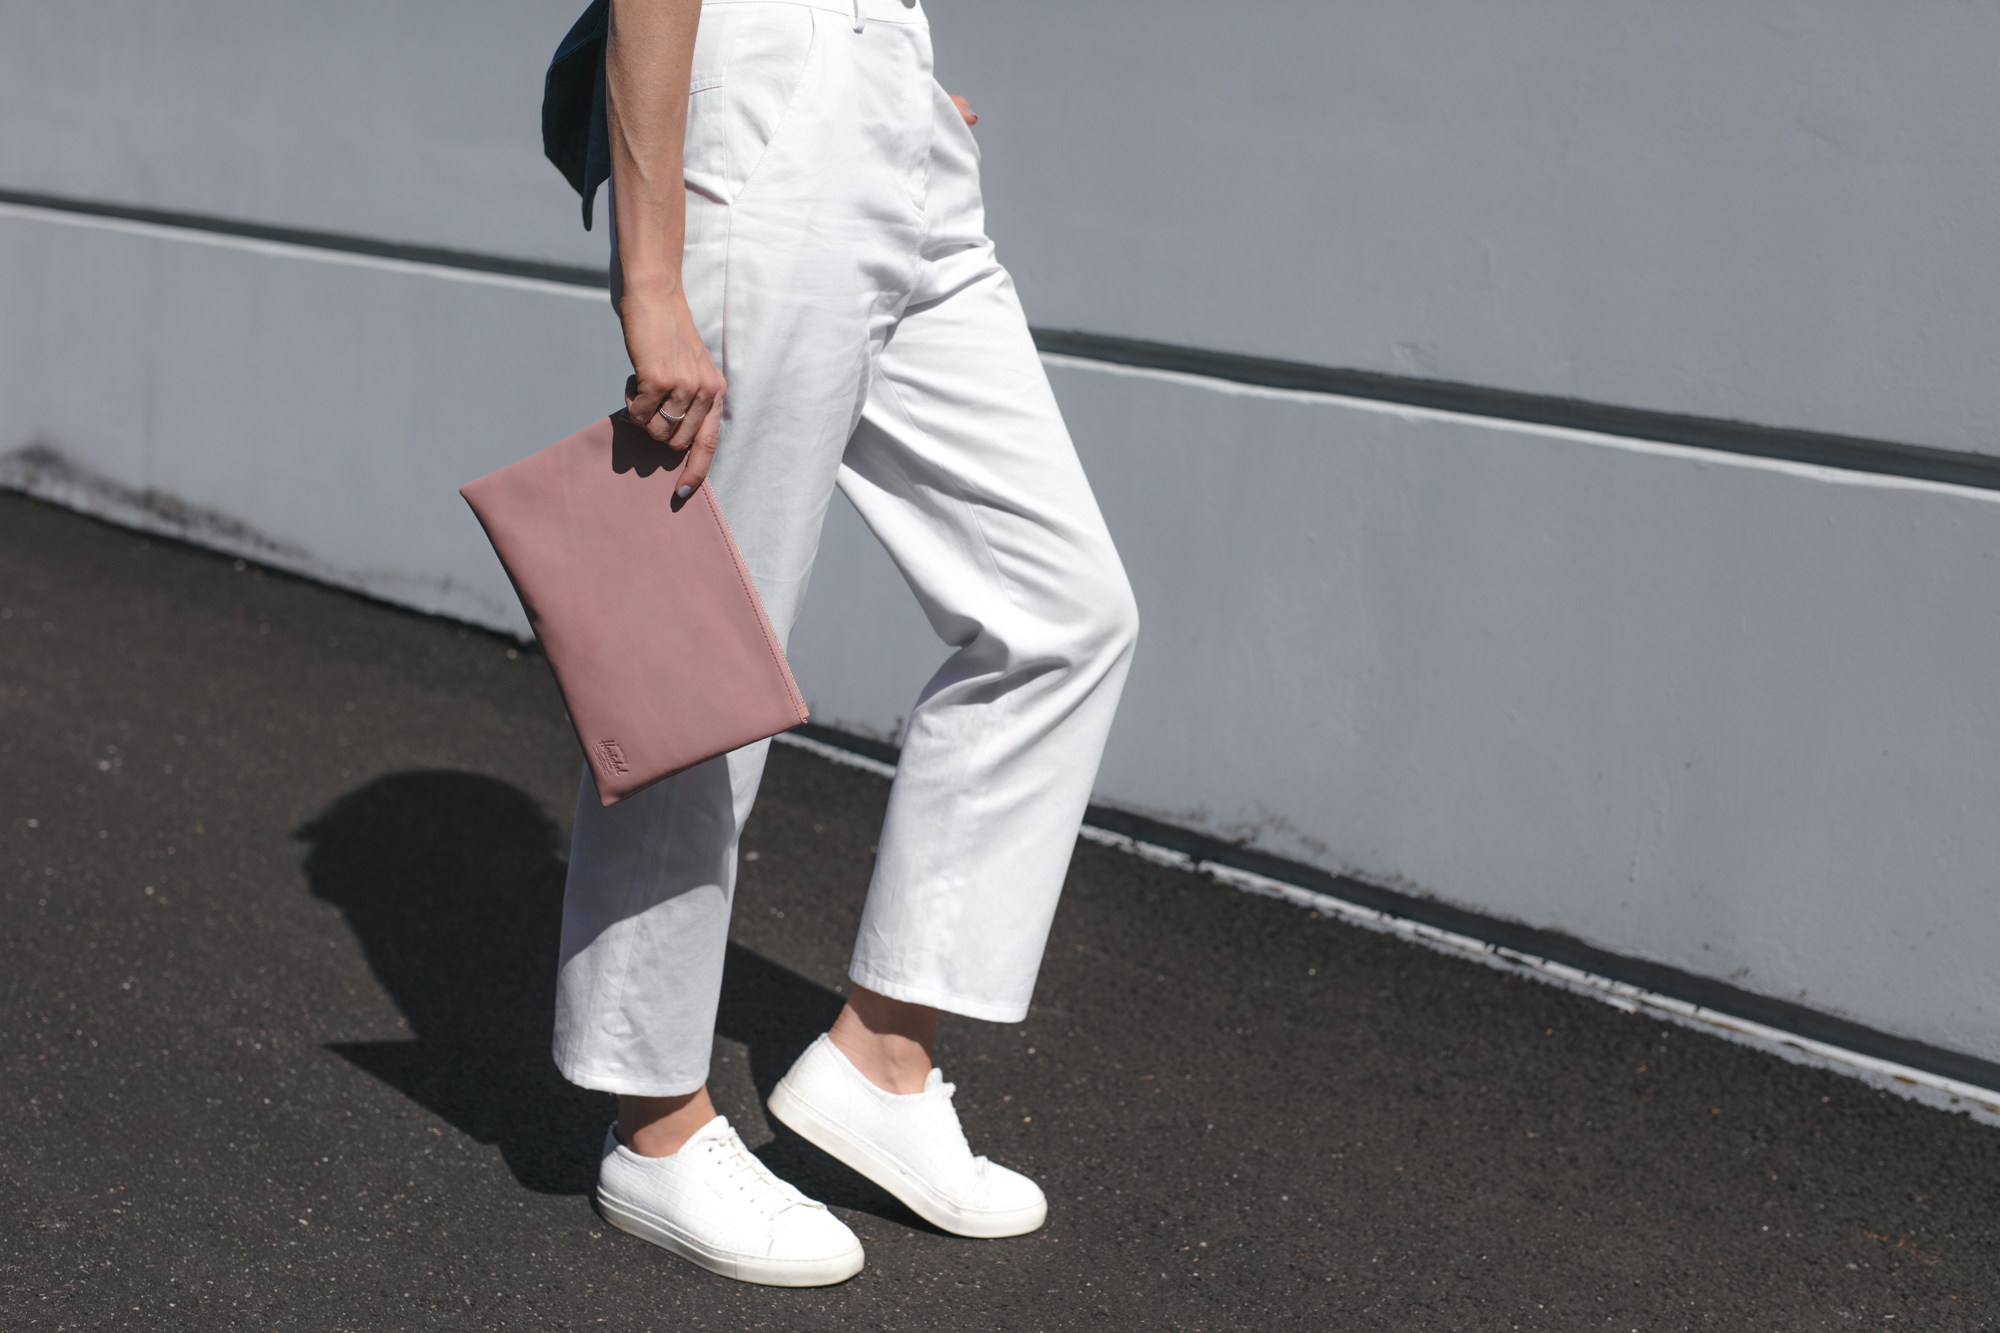 sharday-engel-toit-volant-herschel-axel-arigato-vancouver-fashion-blogger-mama9204.jpg